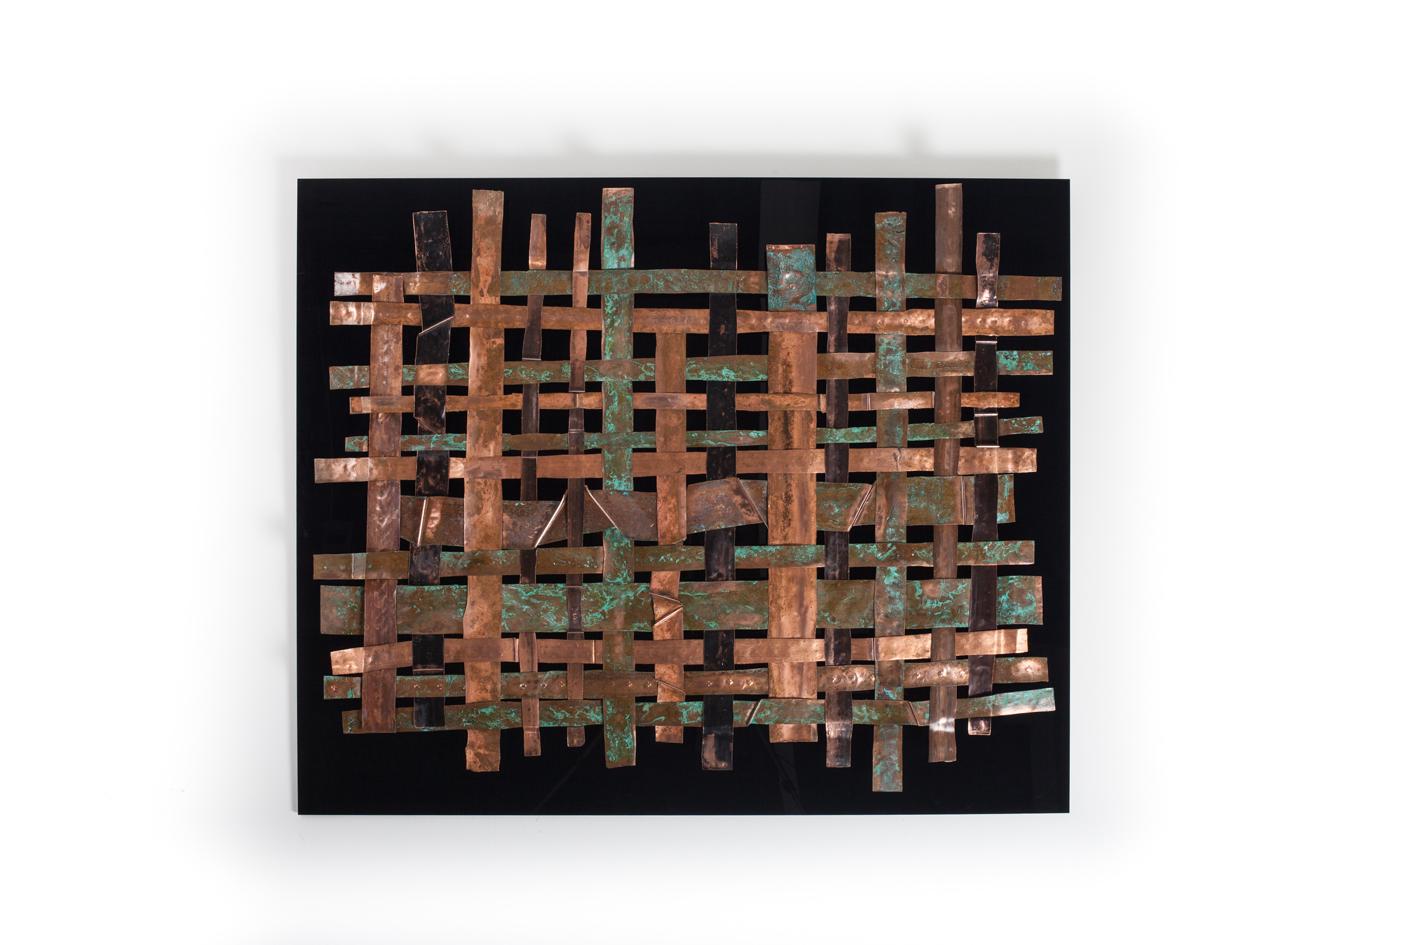 Metal Wall Art Panels copper weave metal wall art panel | wallsloveart | foundmyself